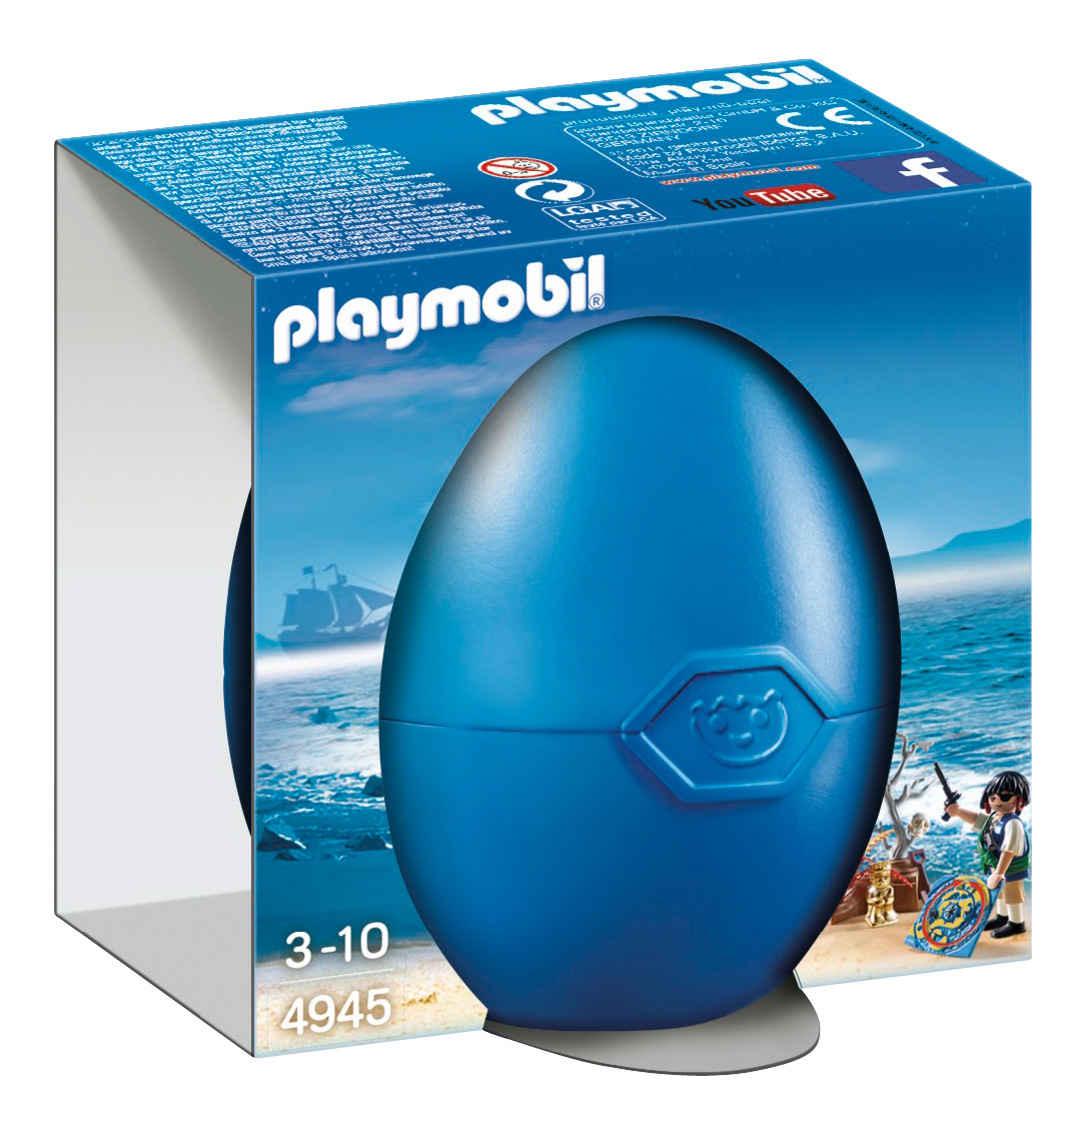 Christmas Week - 20% Rabatt auf Playmobil ( Bsp. in der Beschreibung ) bei [Galeria Kaufhof]